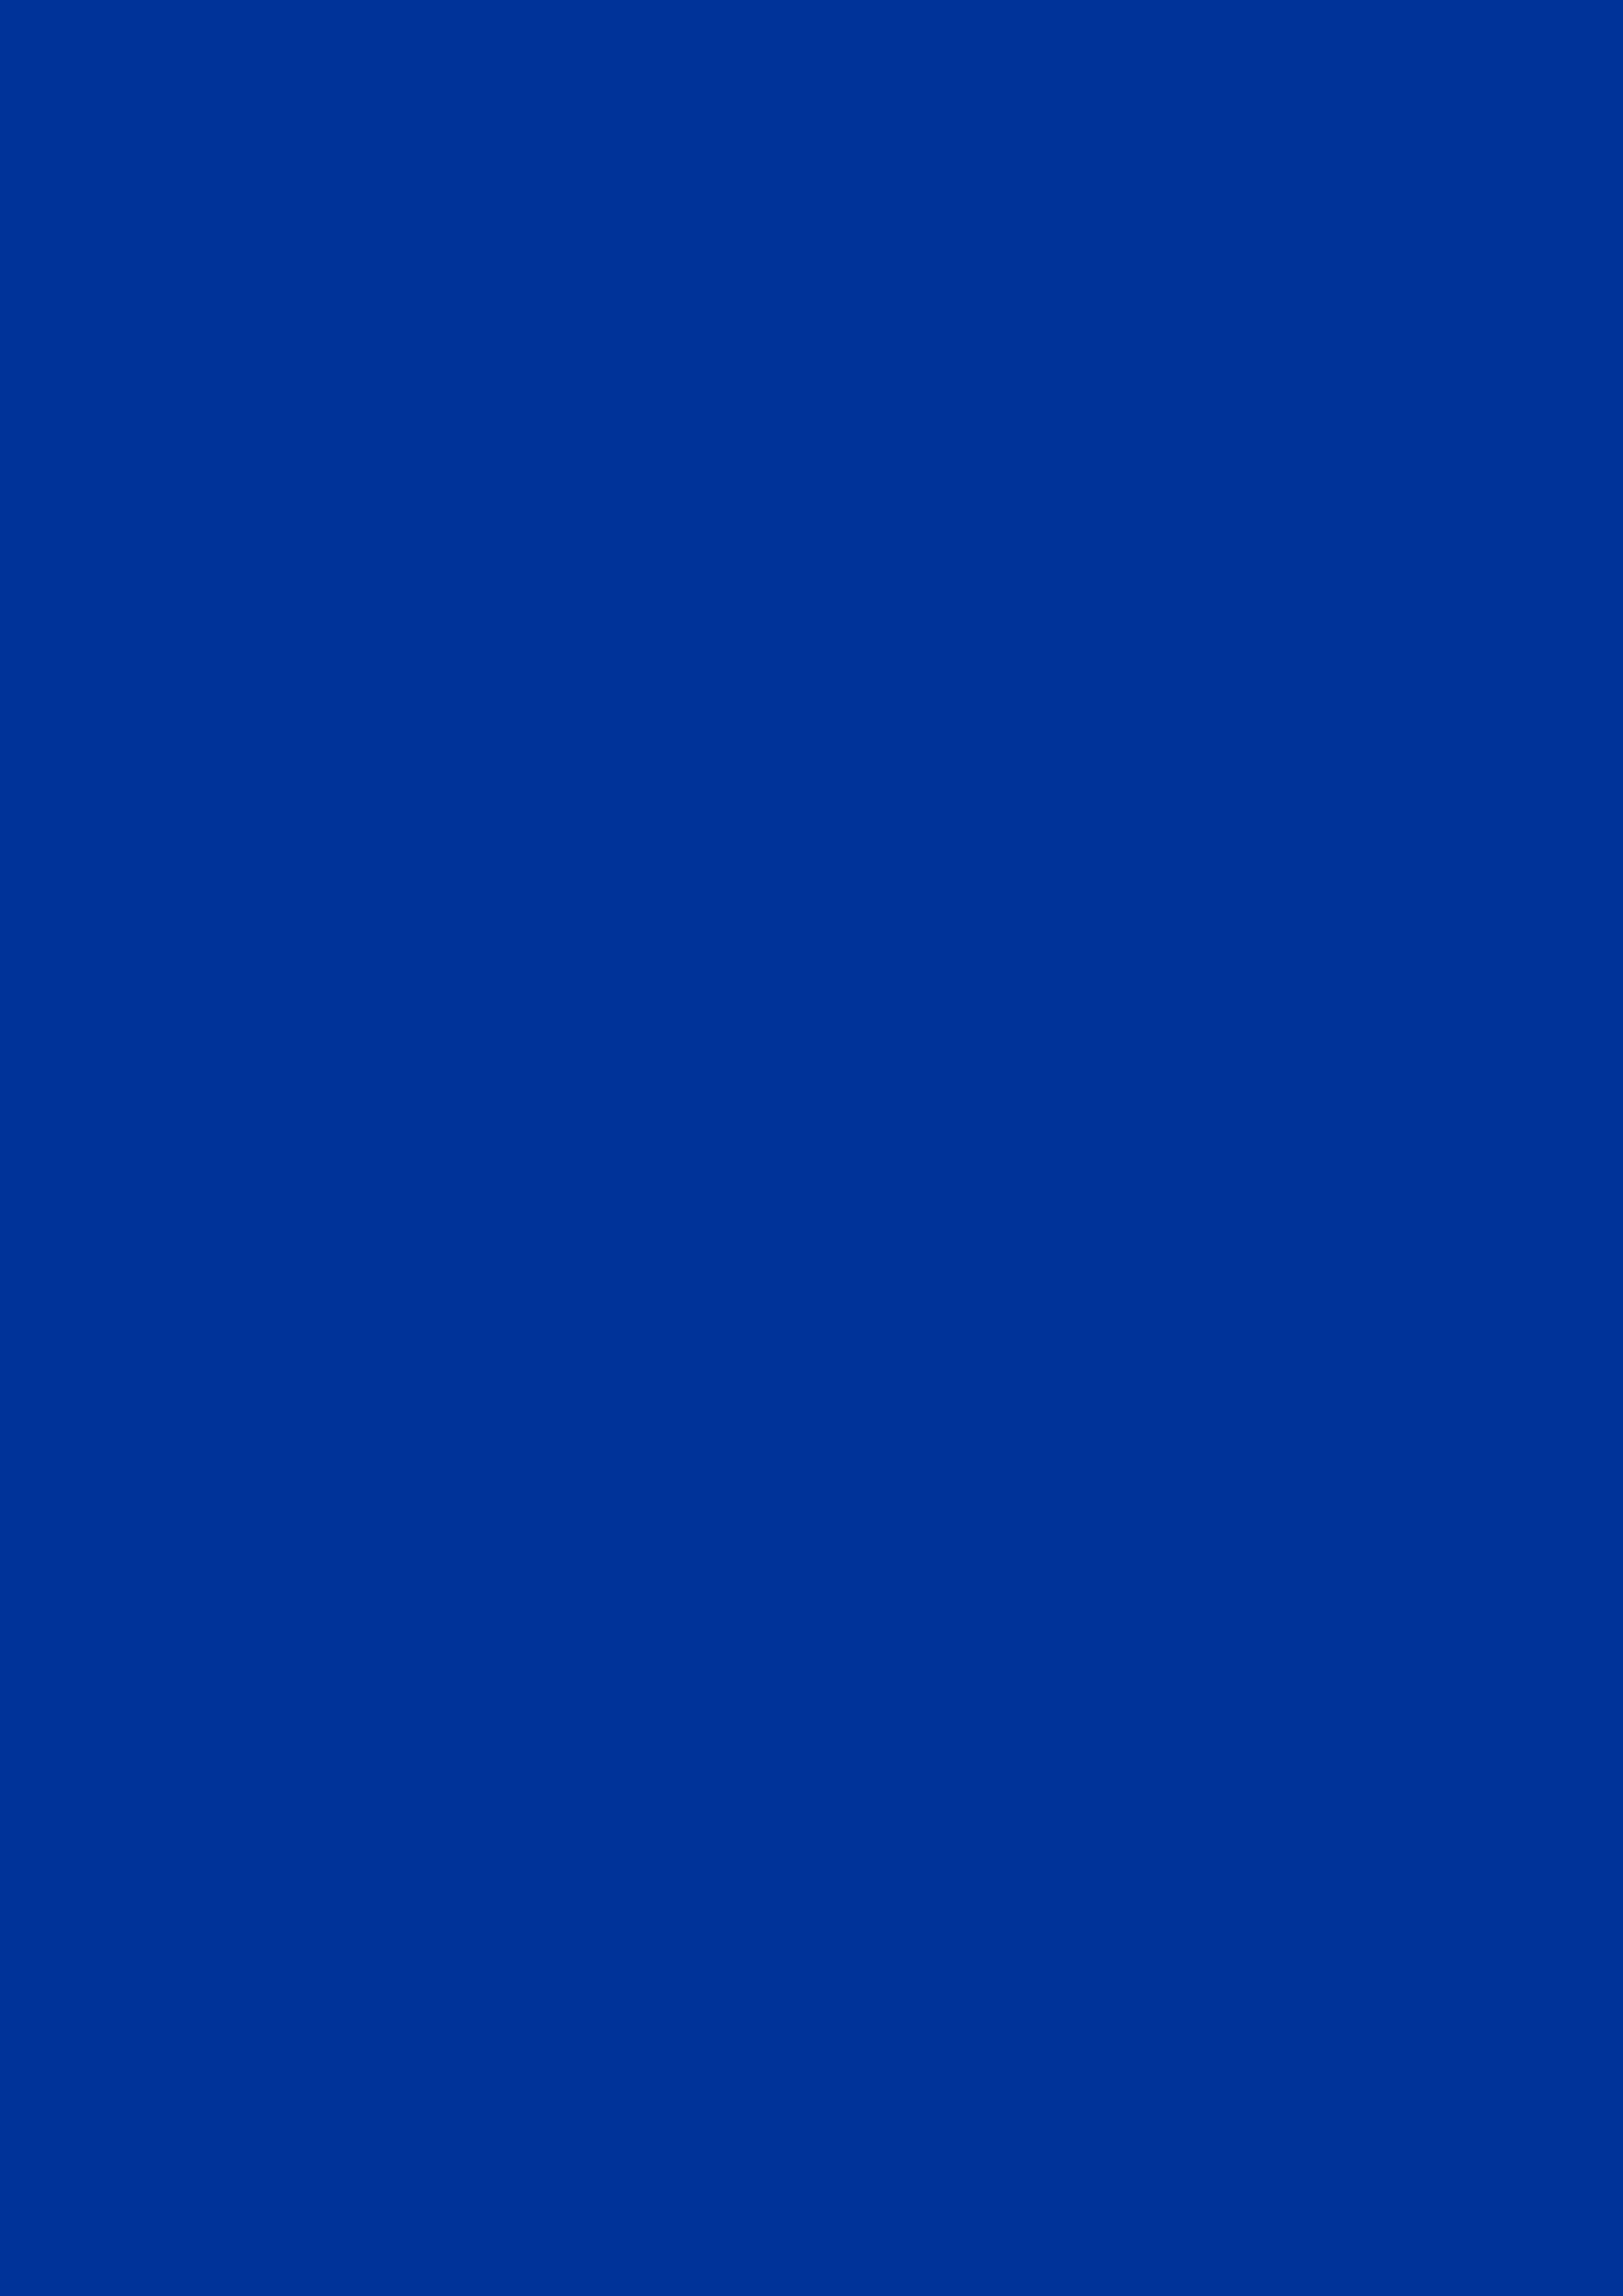 2480x3508 Dark Powder Blue Solid Color Background